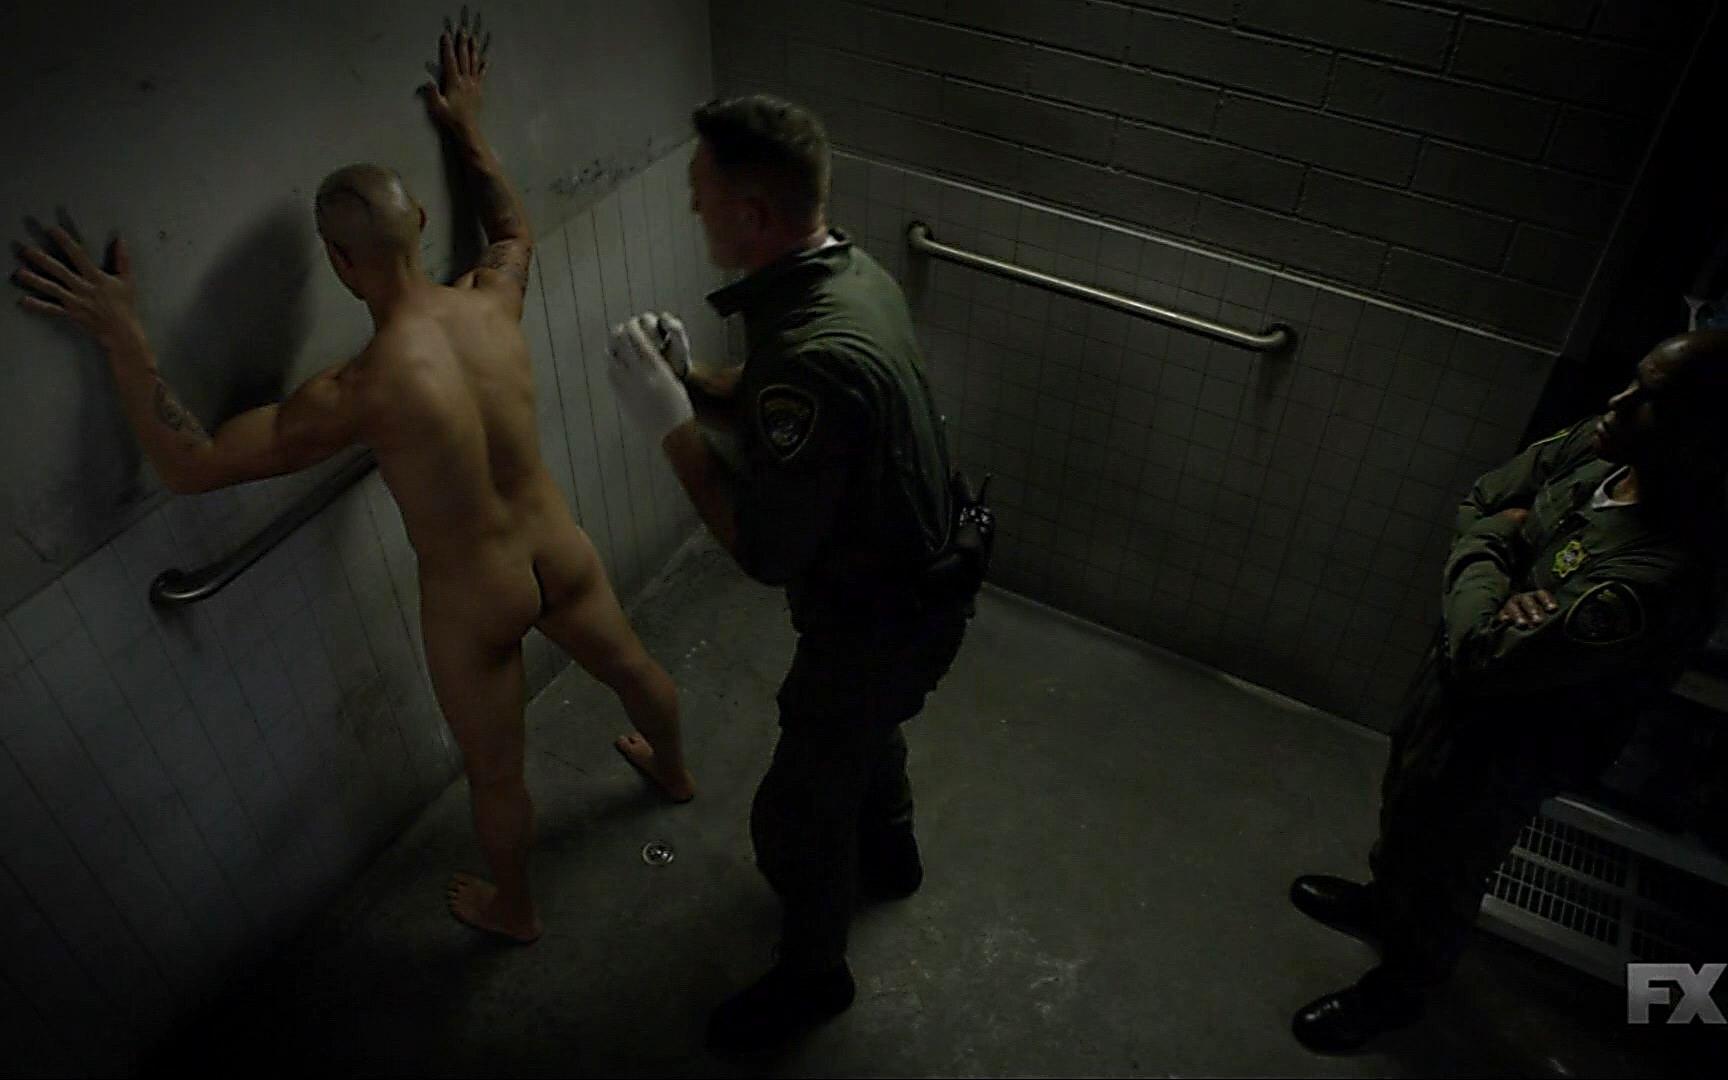 Theo Rossi sexy shirtless scene November 6, 2014, 1am